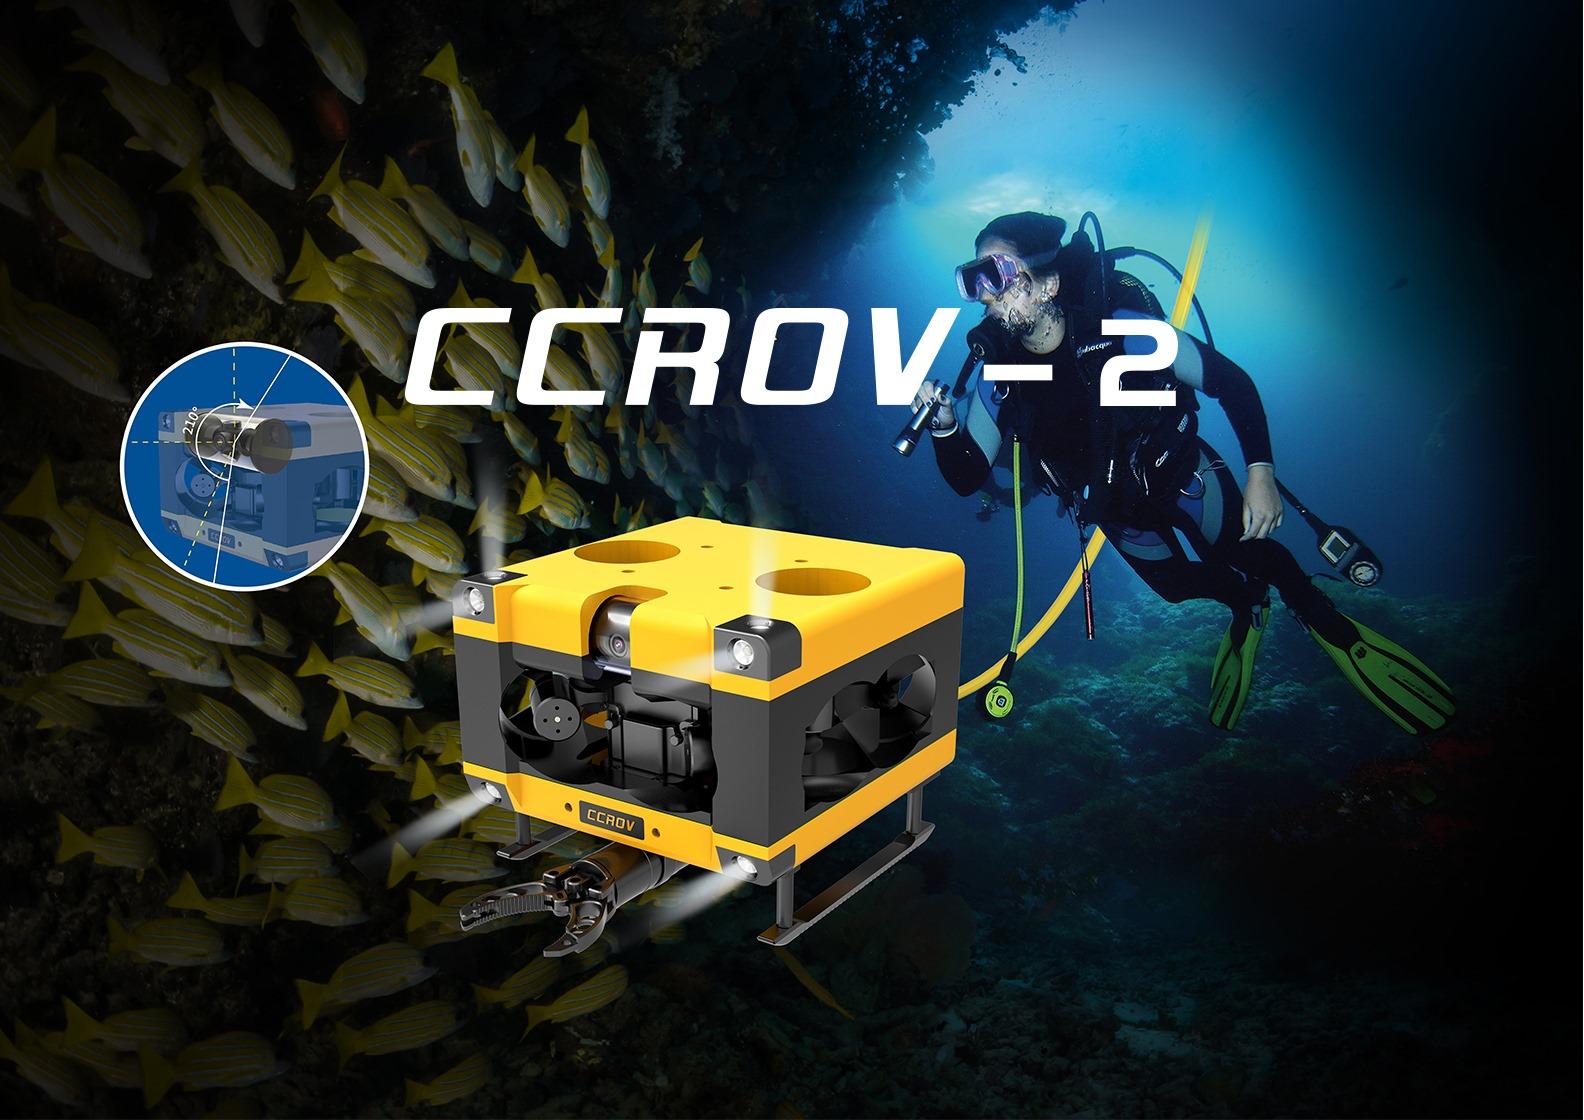 shenzhen-vxfly-ccrov-2-rov-robotic-arm-claw.jpg